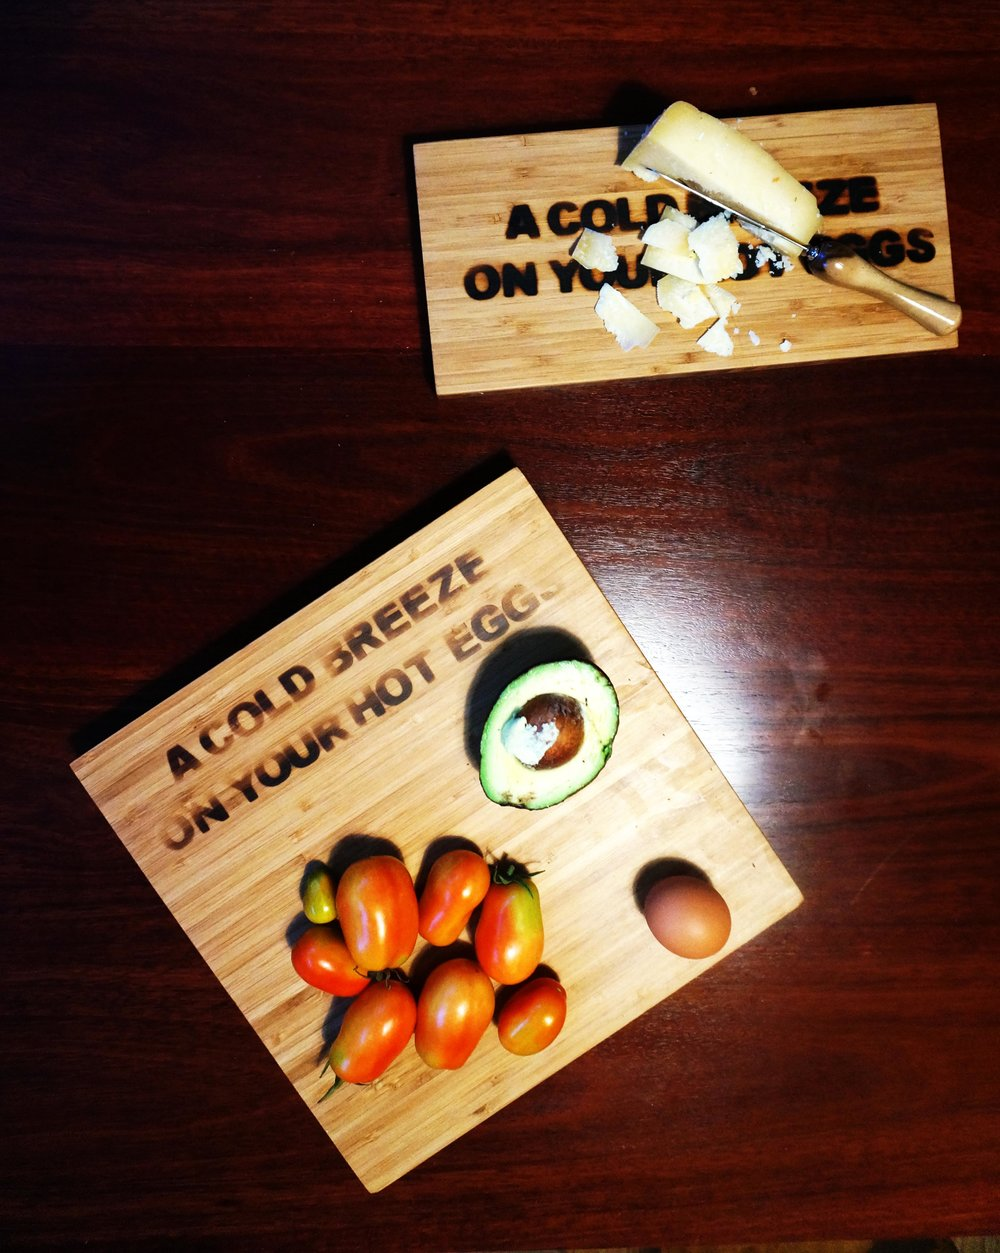 - A Cold Breeze On Your Hot Eggs Breadboard$15.00Contact: joel@joelgailer.com.au